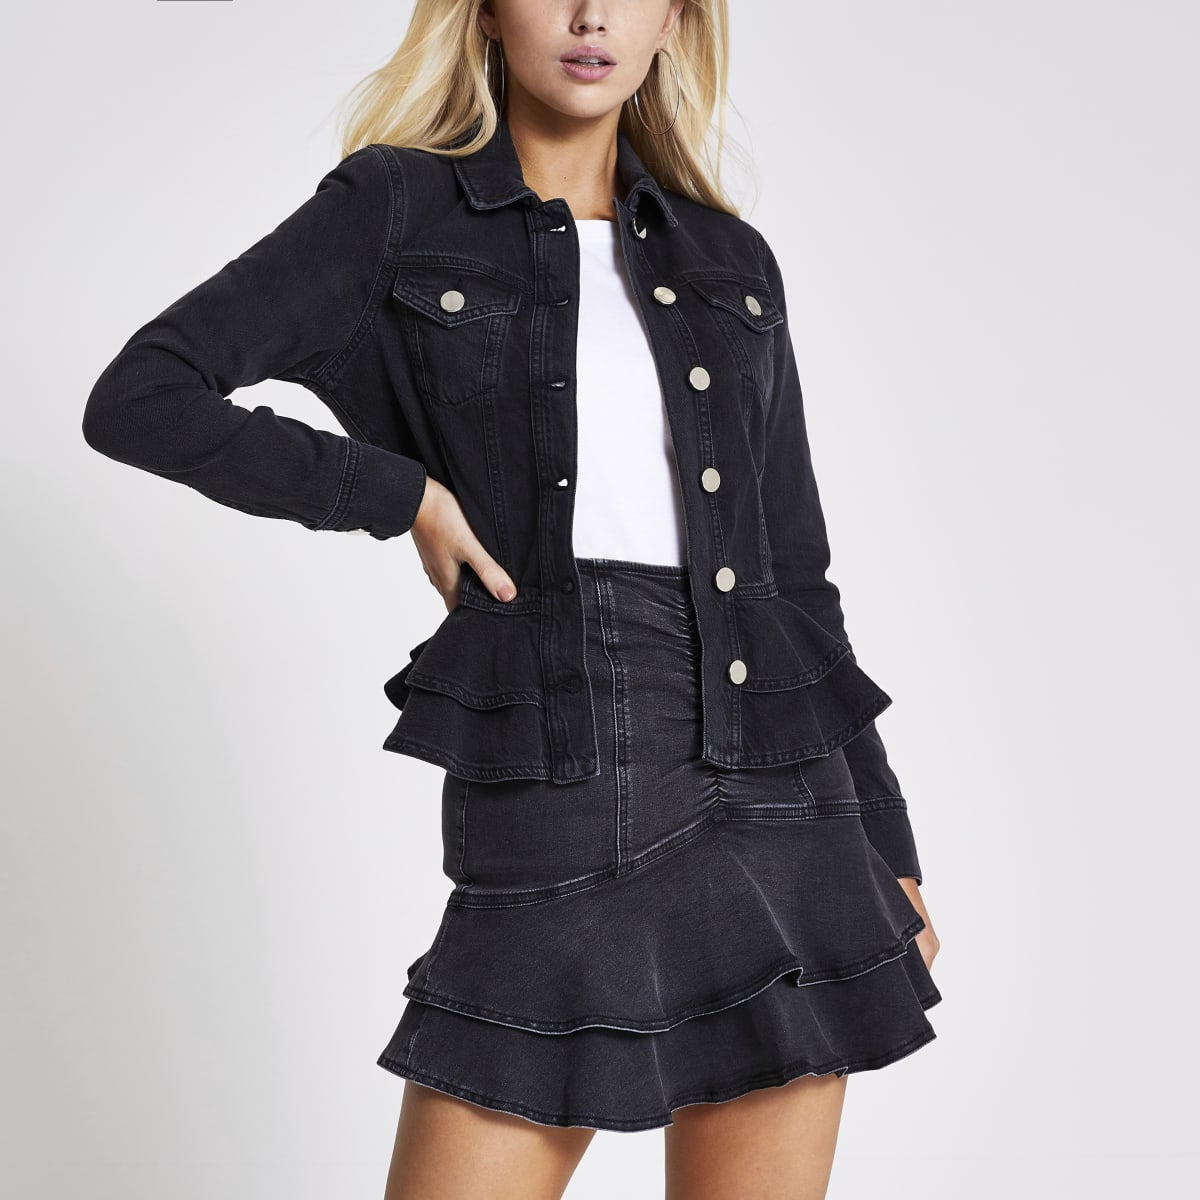 Black frill fitted denim jacket